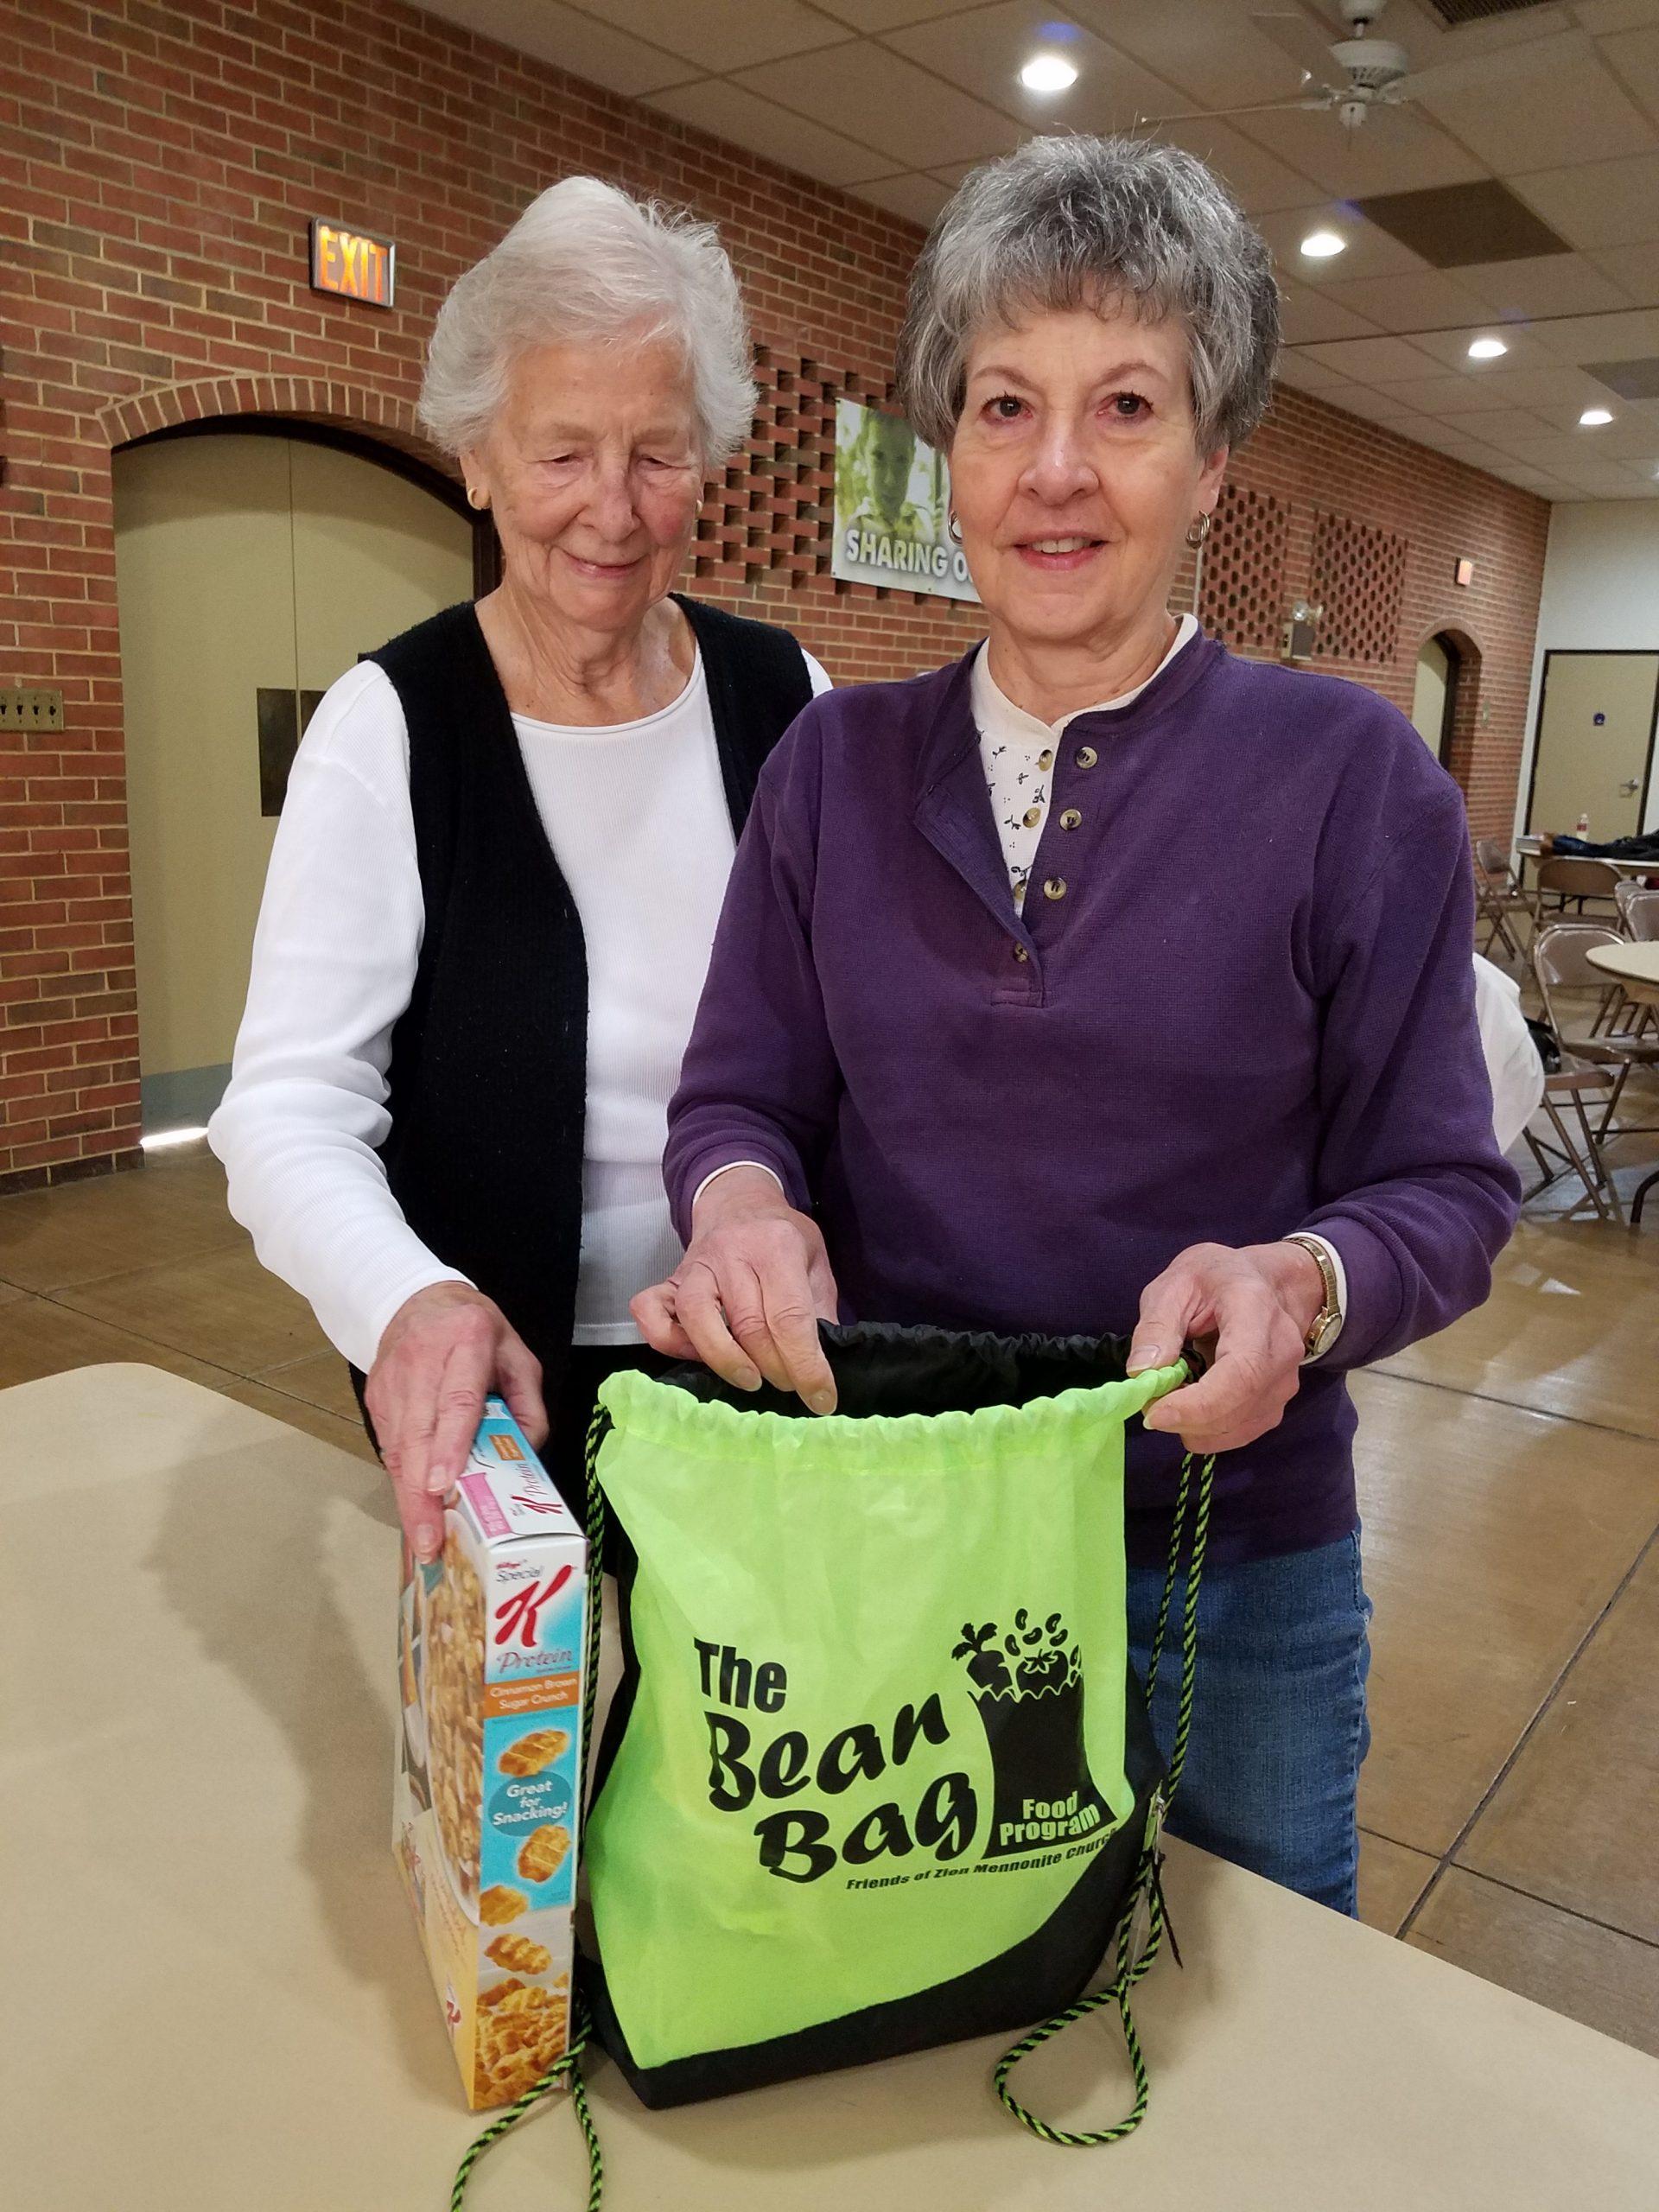 Volunteers for The Bean Bag Food Program